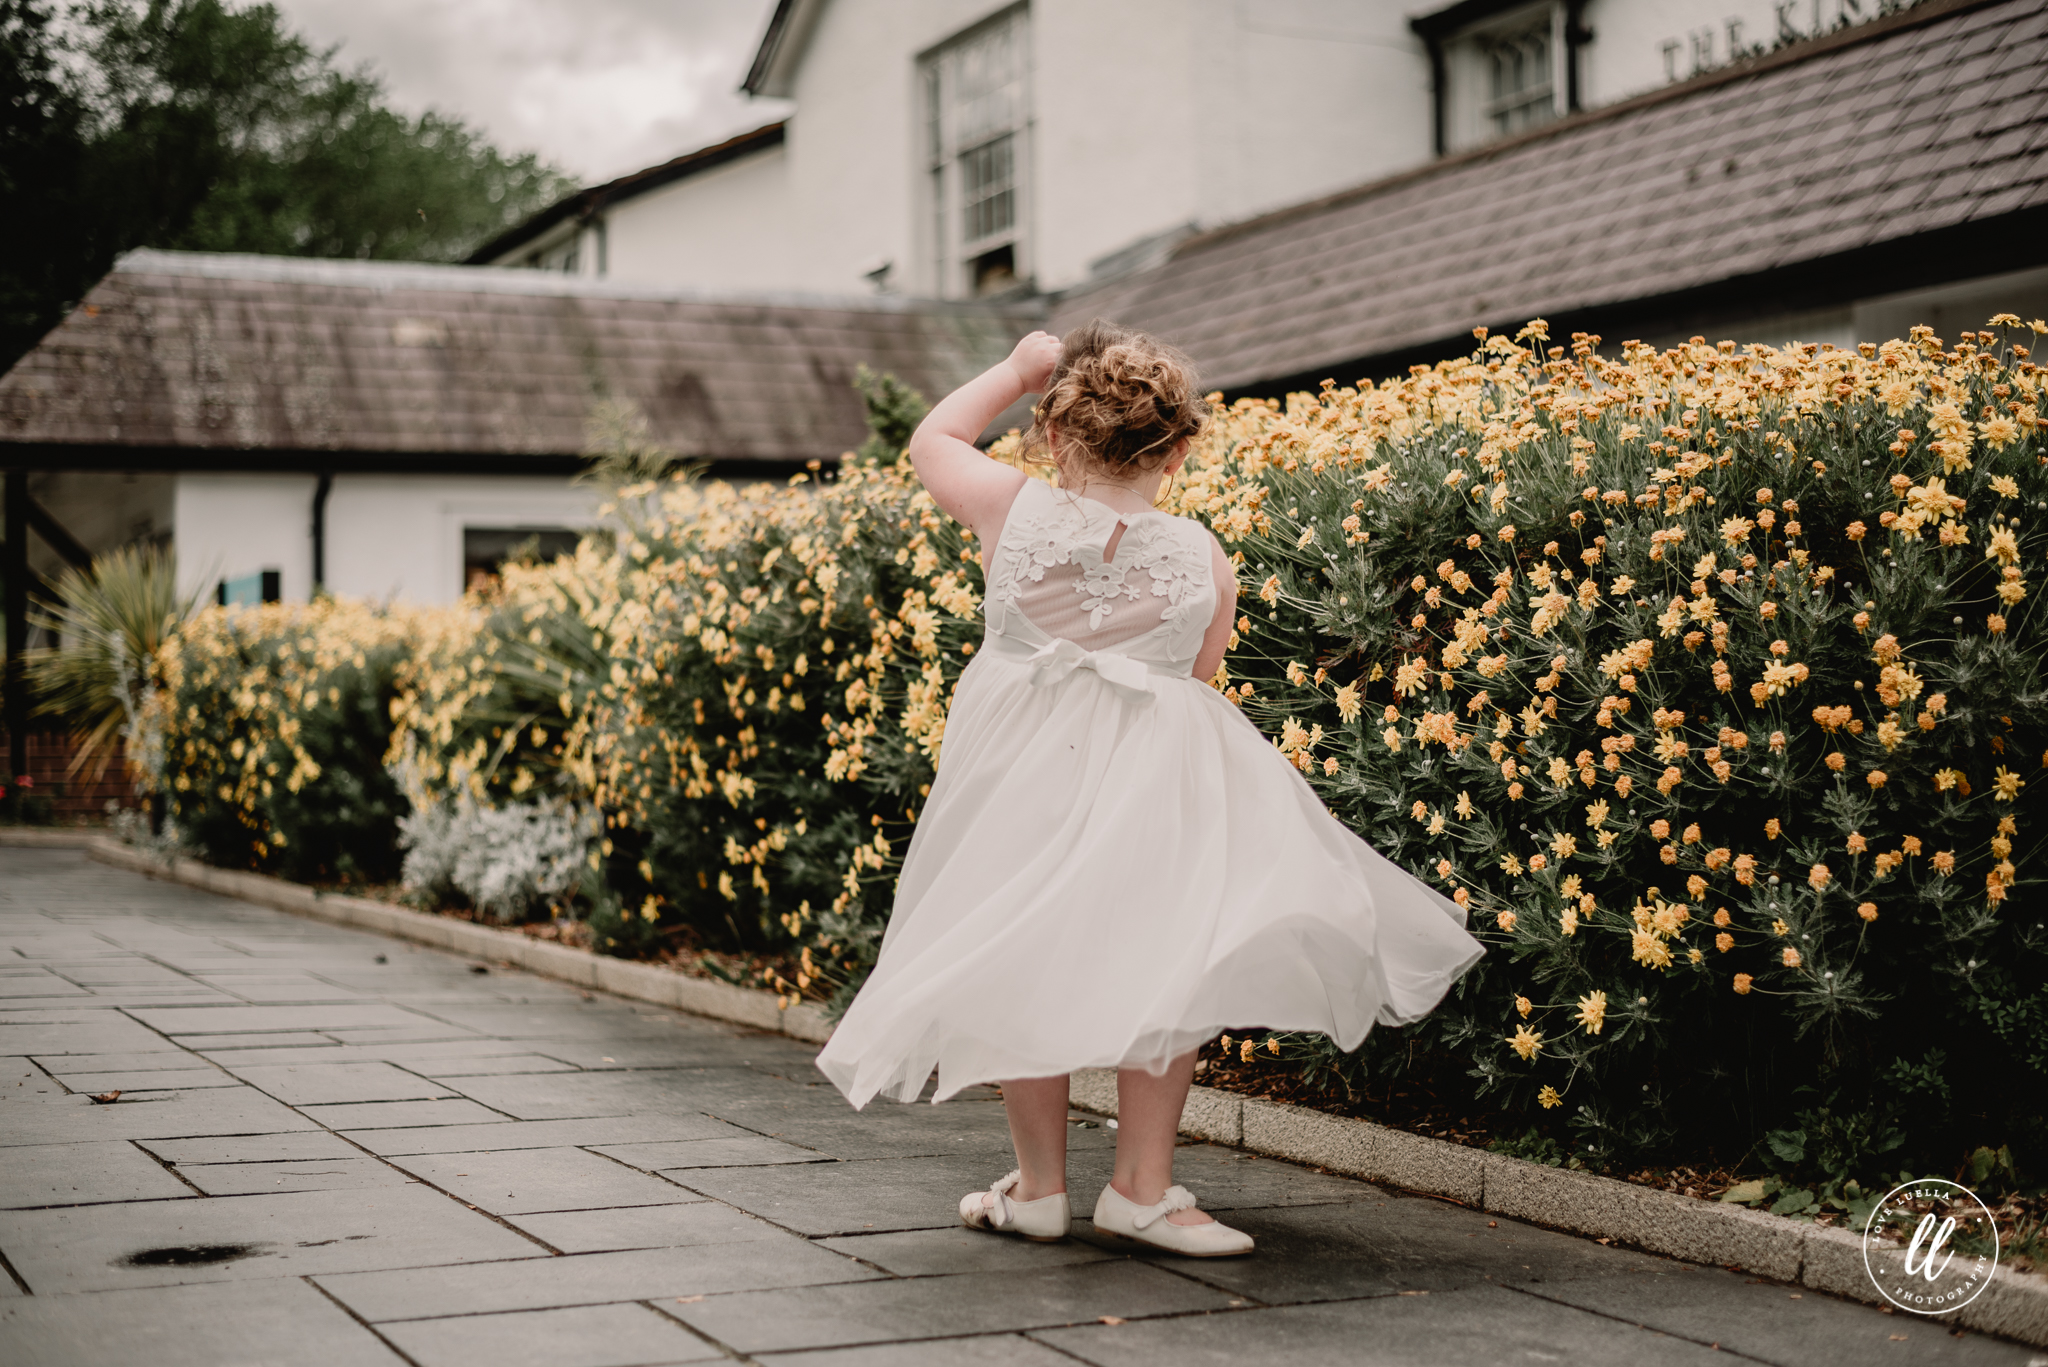 A twirling flower girl outside The Kinmel and Kinspa